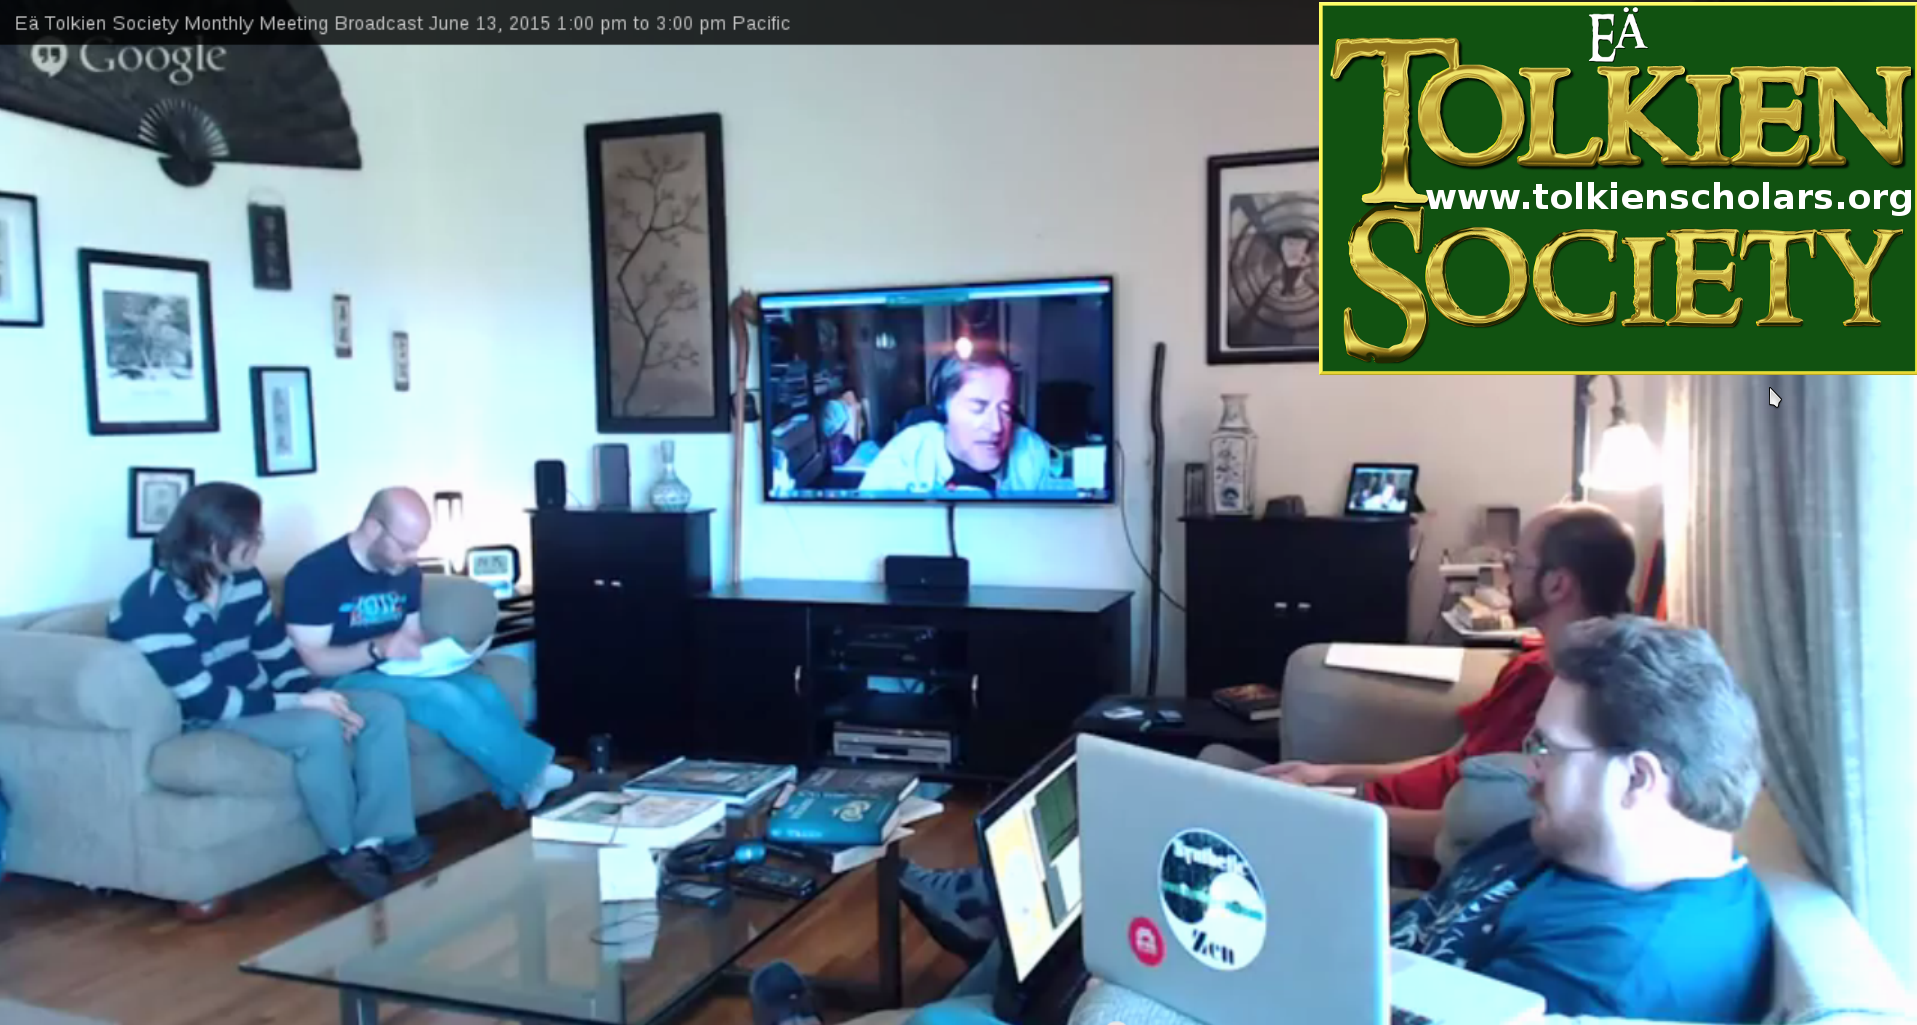 Tolkien Society Meeting April 16